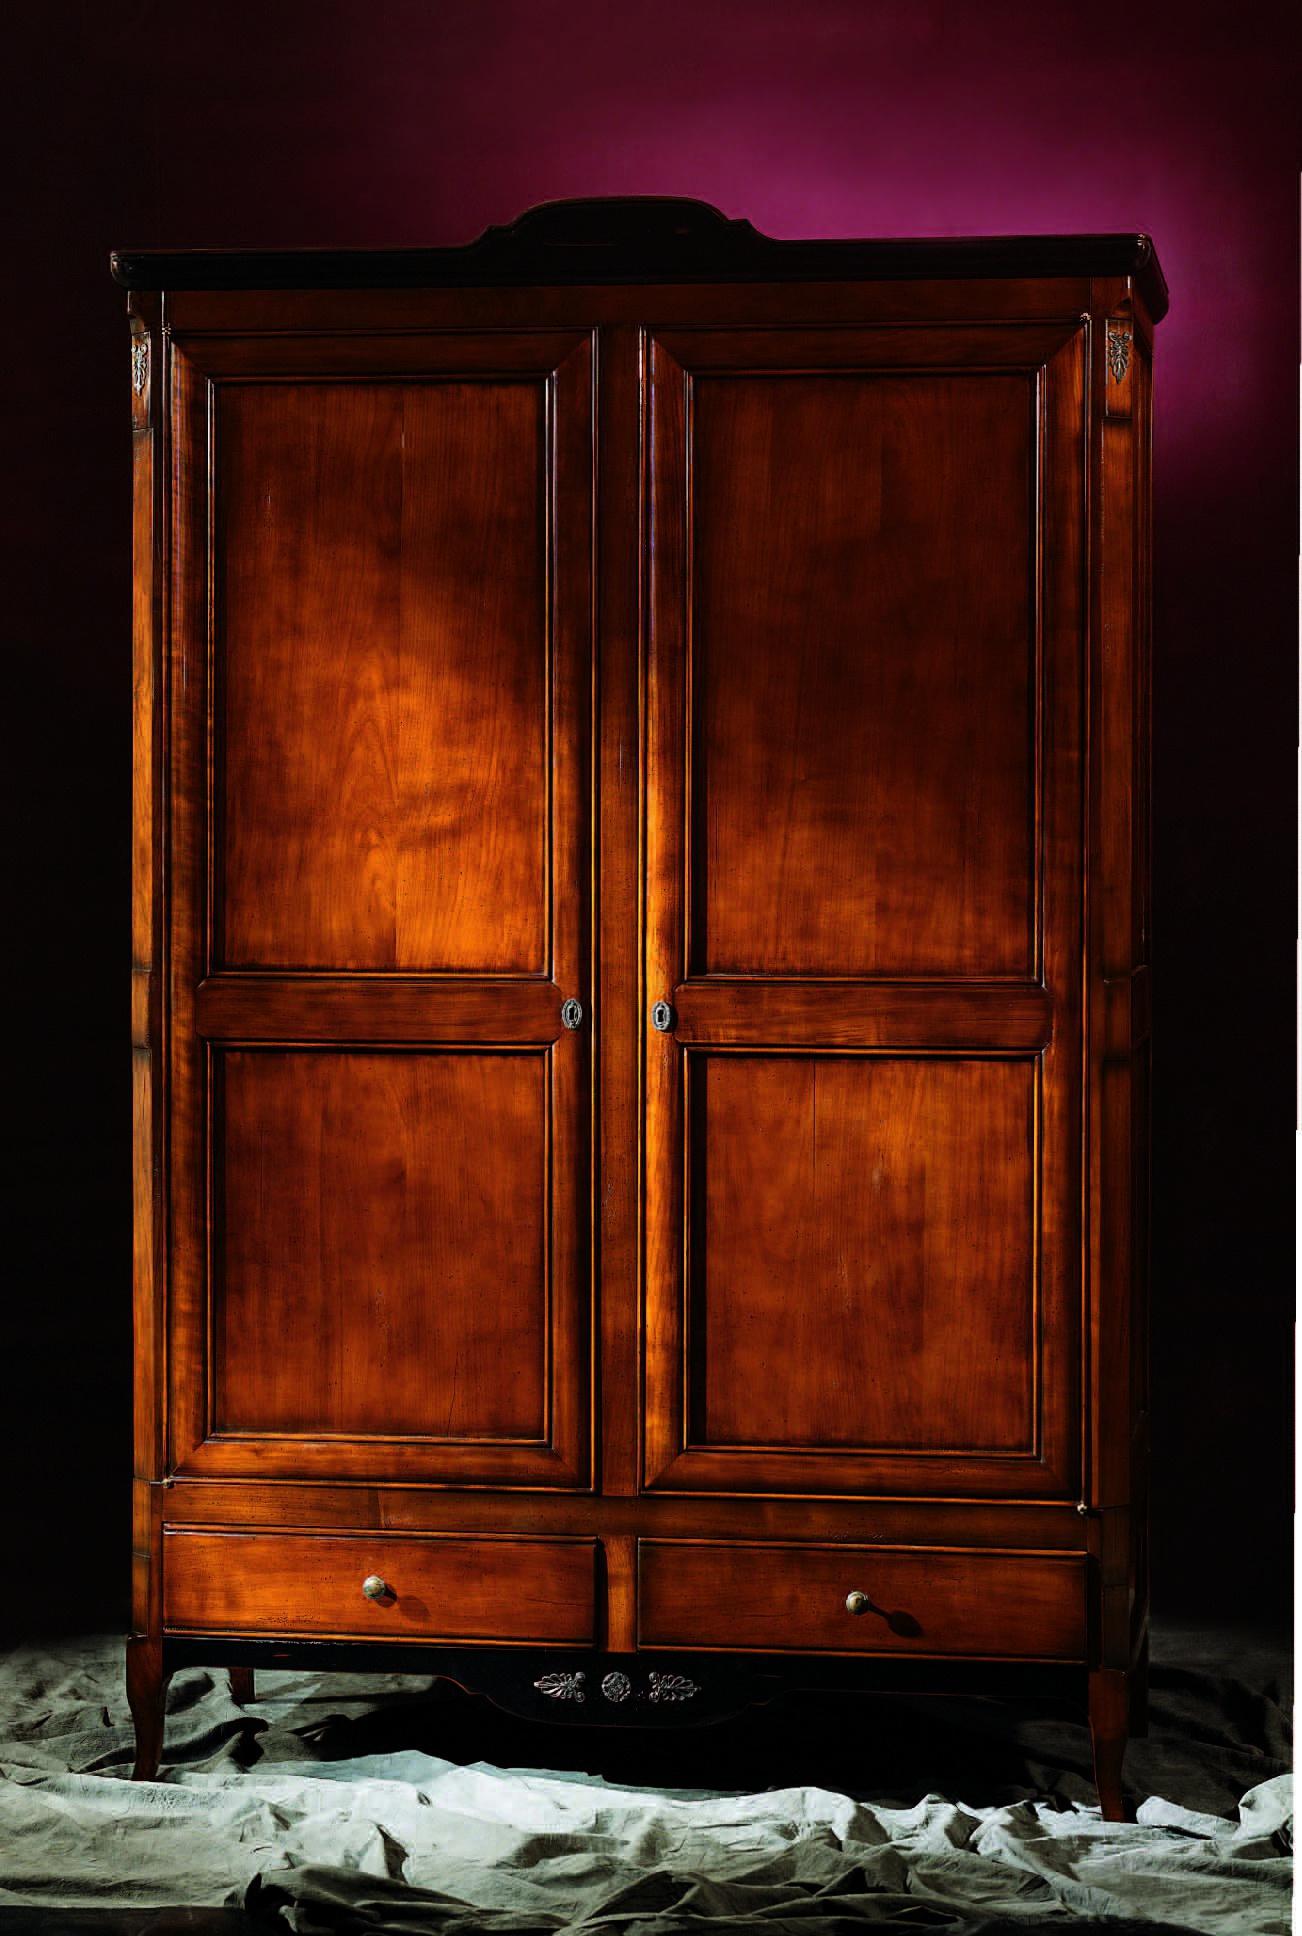 Шкаф двустворчатый из дерева stella del mobile - мебель мр.